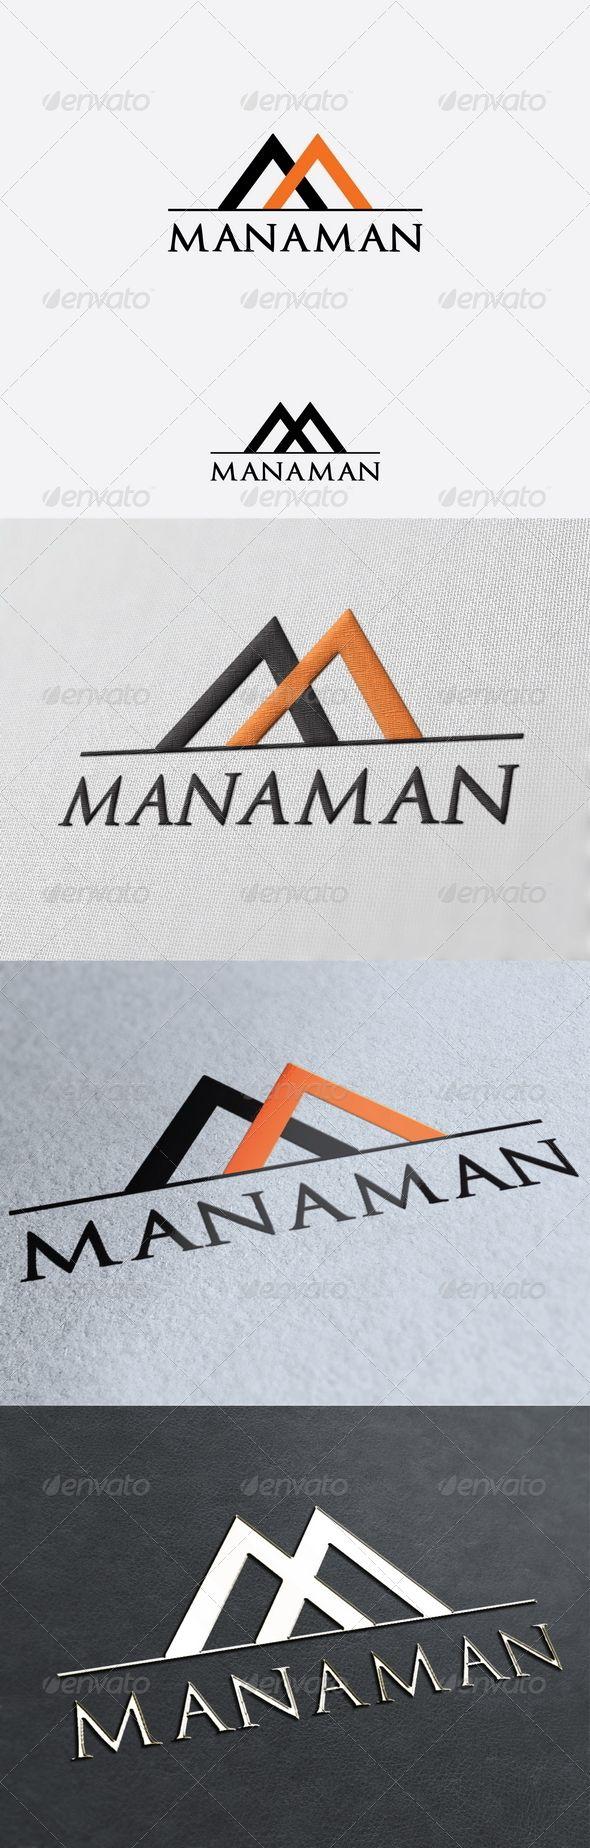 55 best Logo Templates images on Pinterest   Logo templates, Font ...